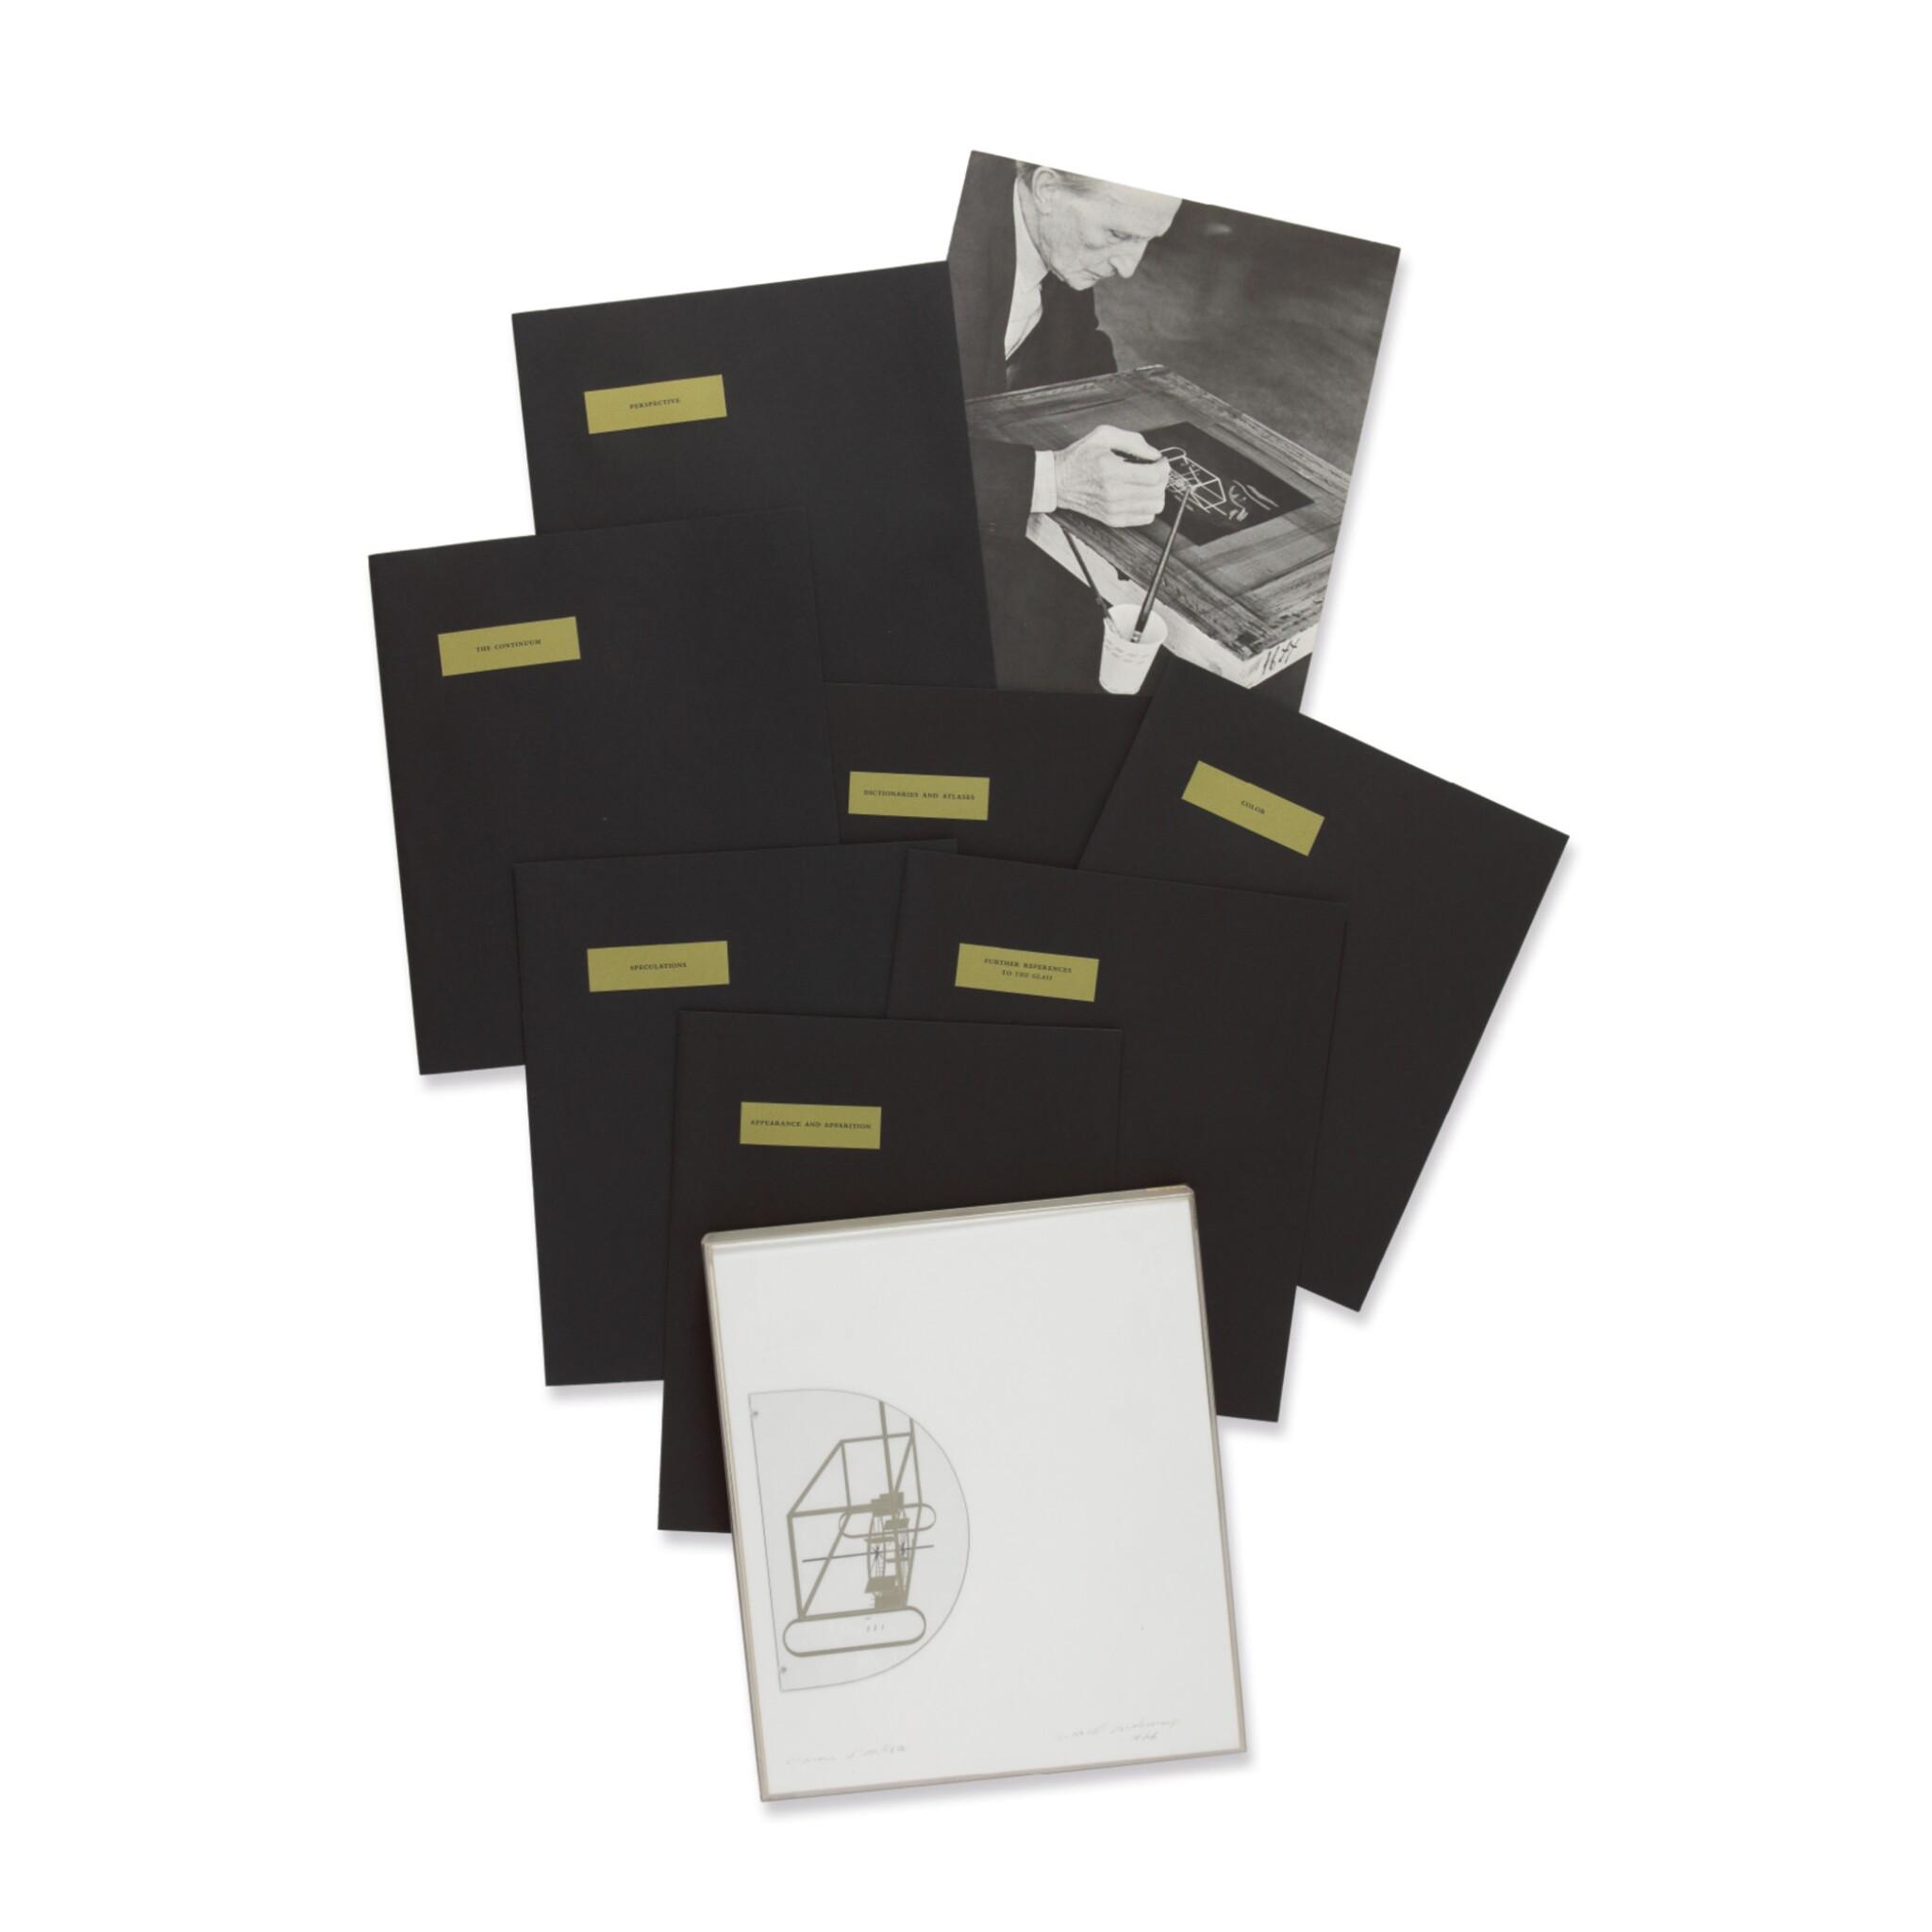 MARCEL DUCHAMP | À L'INFINITIF (THE WHITE BOX) (S. 637)